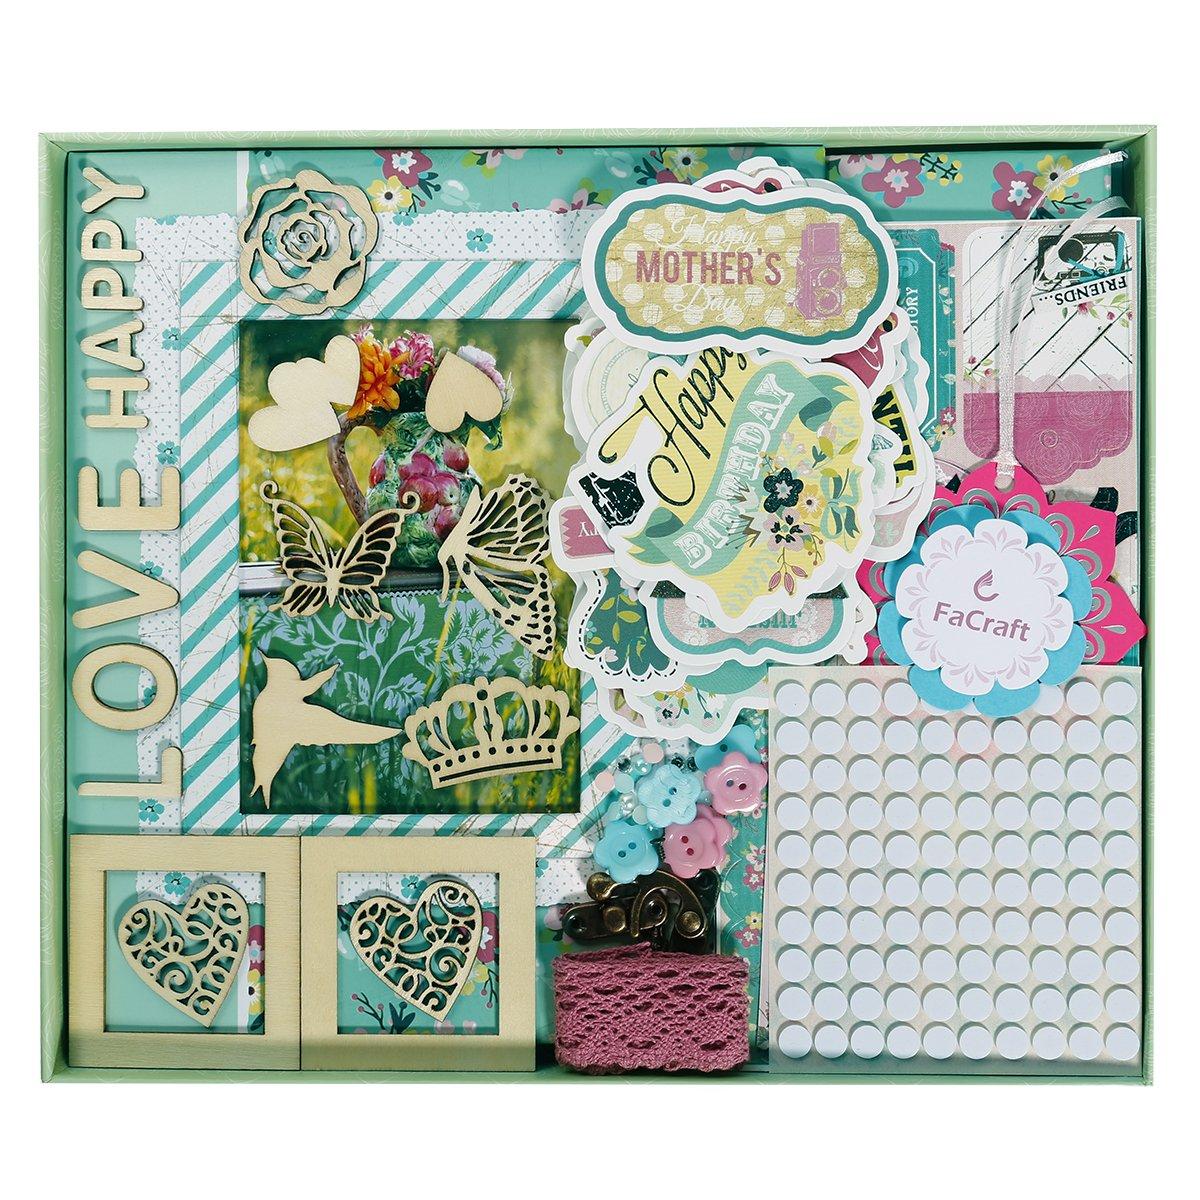 FaCraft 8x8 Scrapbooking Kit for Girls 4336981415